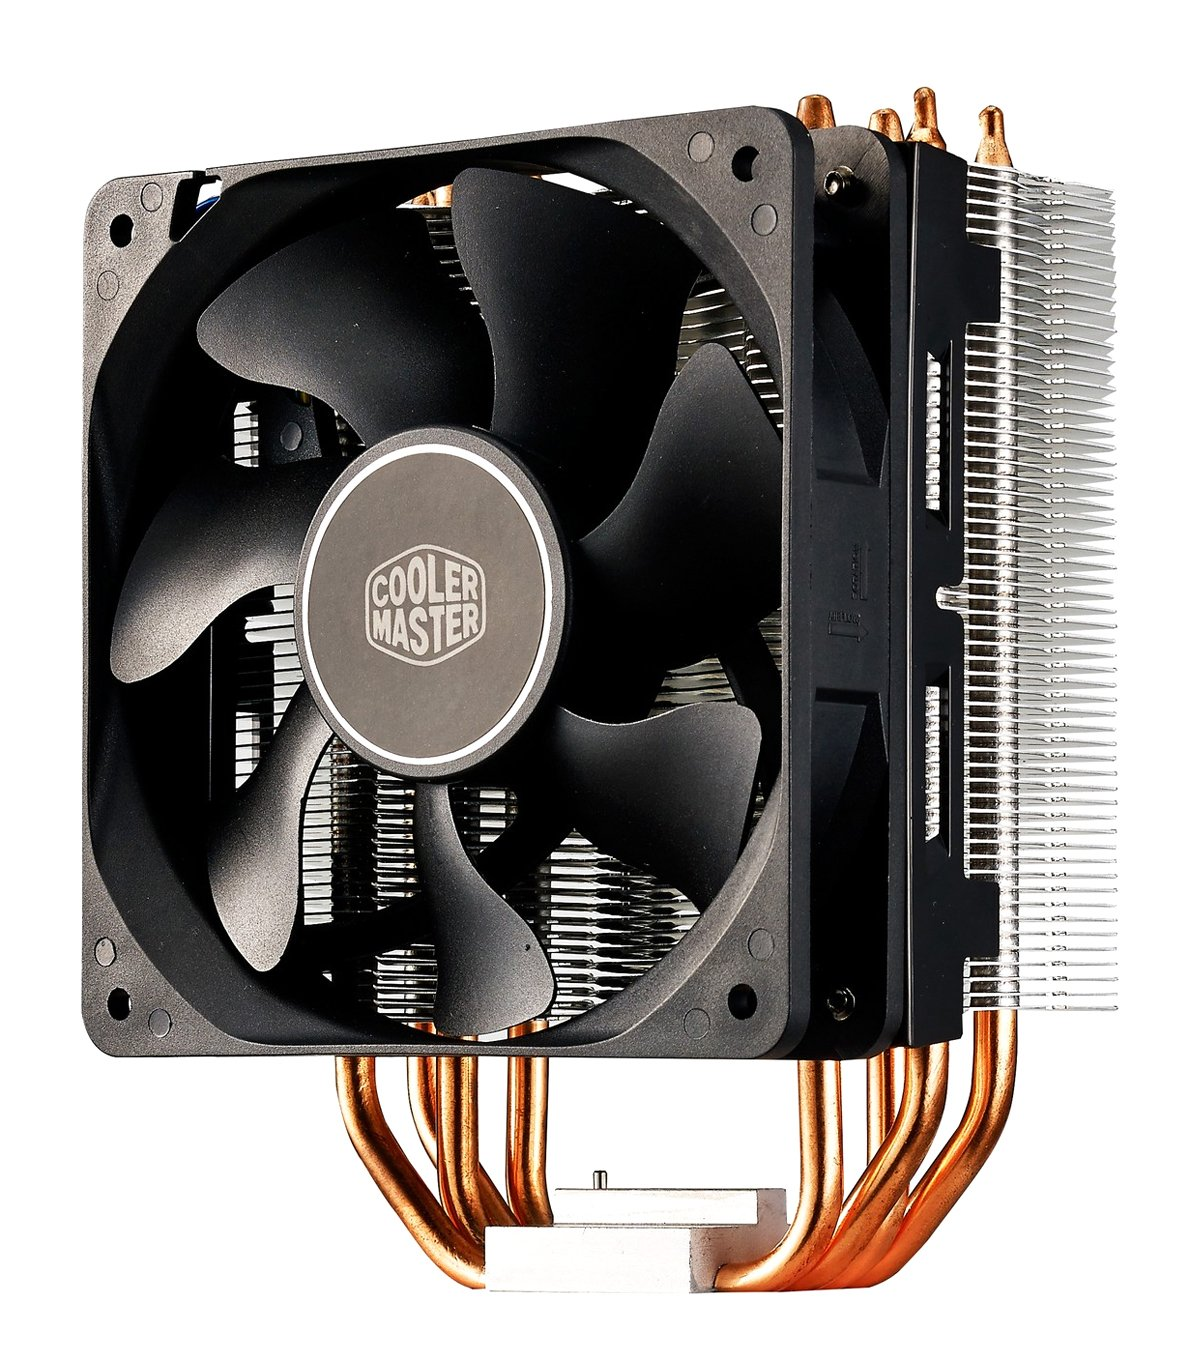 4-Pin Cooler Master Hyper TX3i CPU-K/ühler 3 Heatpipes RR-TX3E-22PK-B1 1x 92mm PWM L/üfter PWM